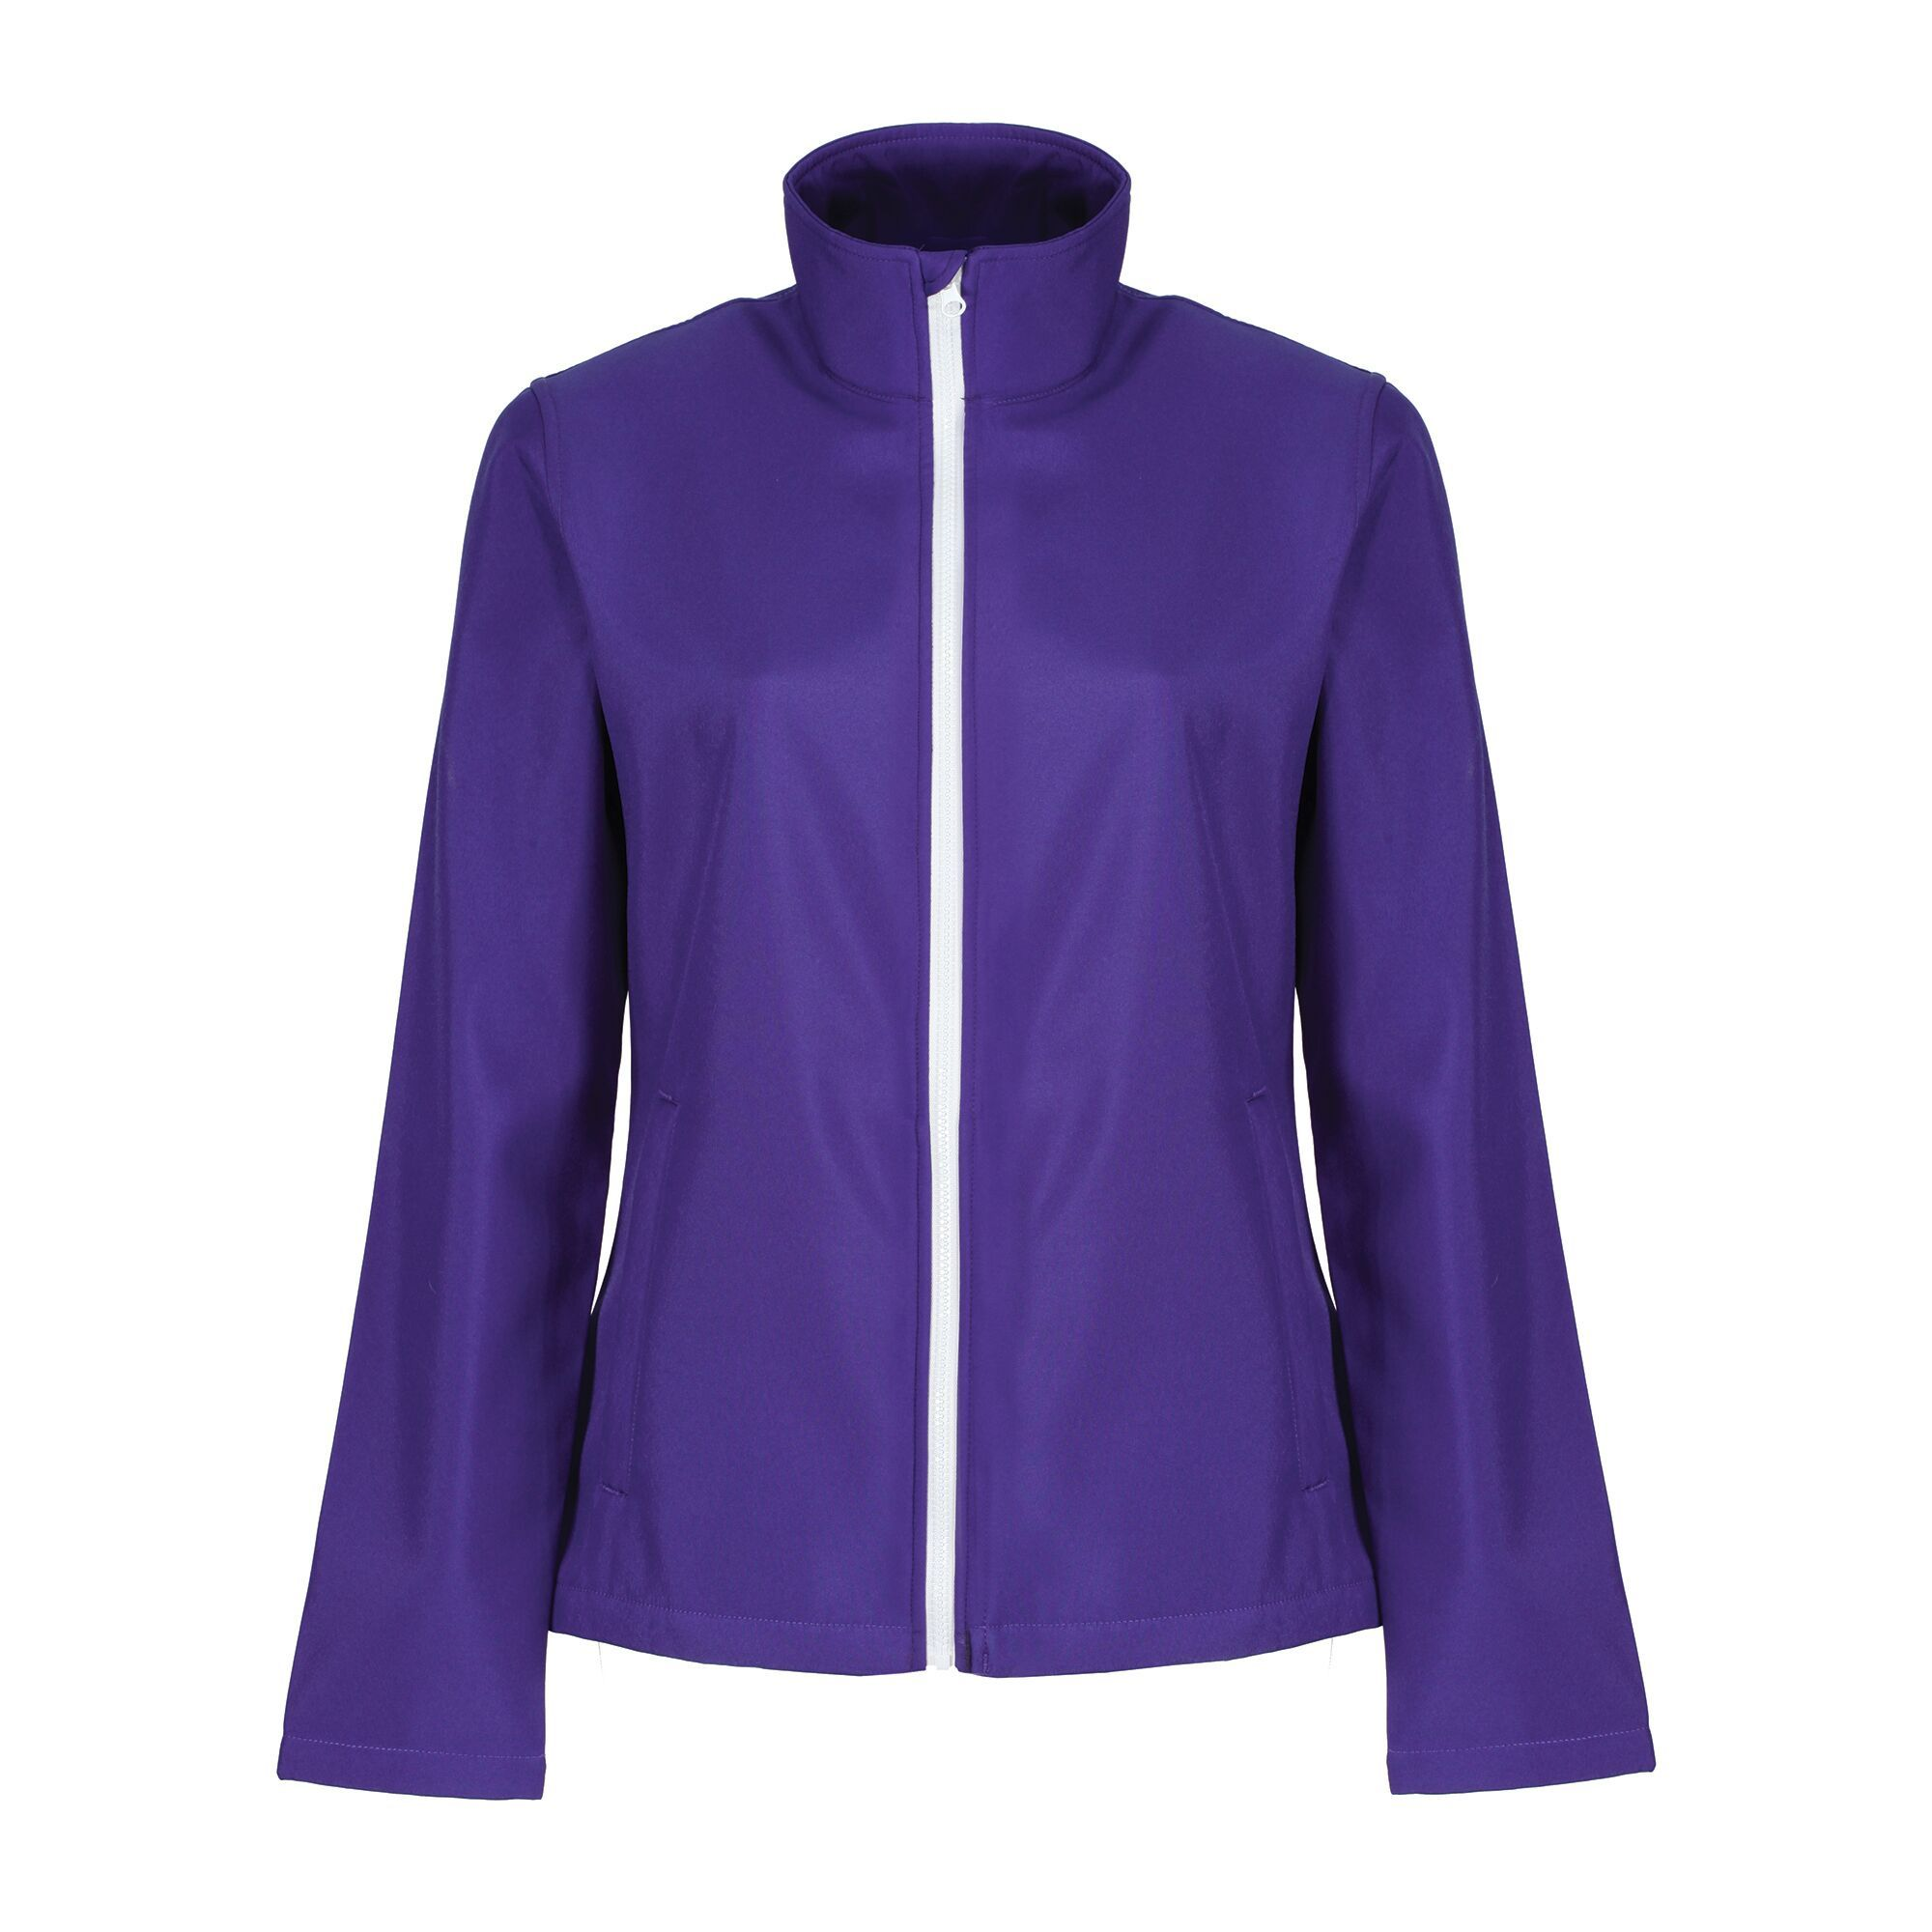 Regatta Womens/Ladies Ablaze Printable Softshell Jacket (14 UK) (Purple/Black)